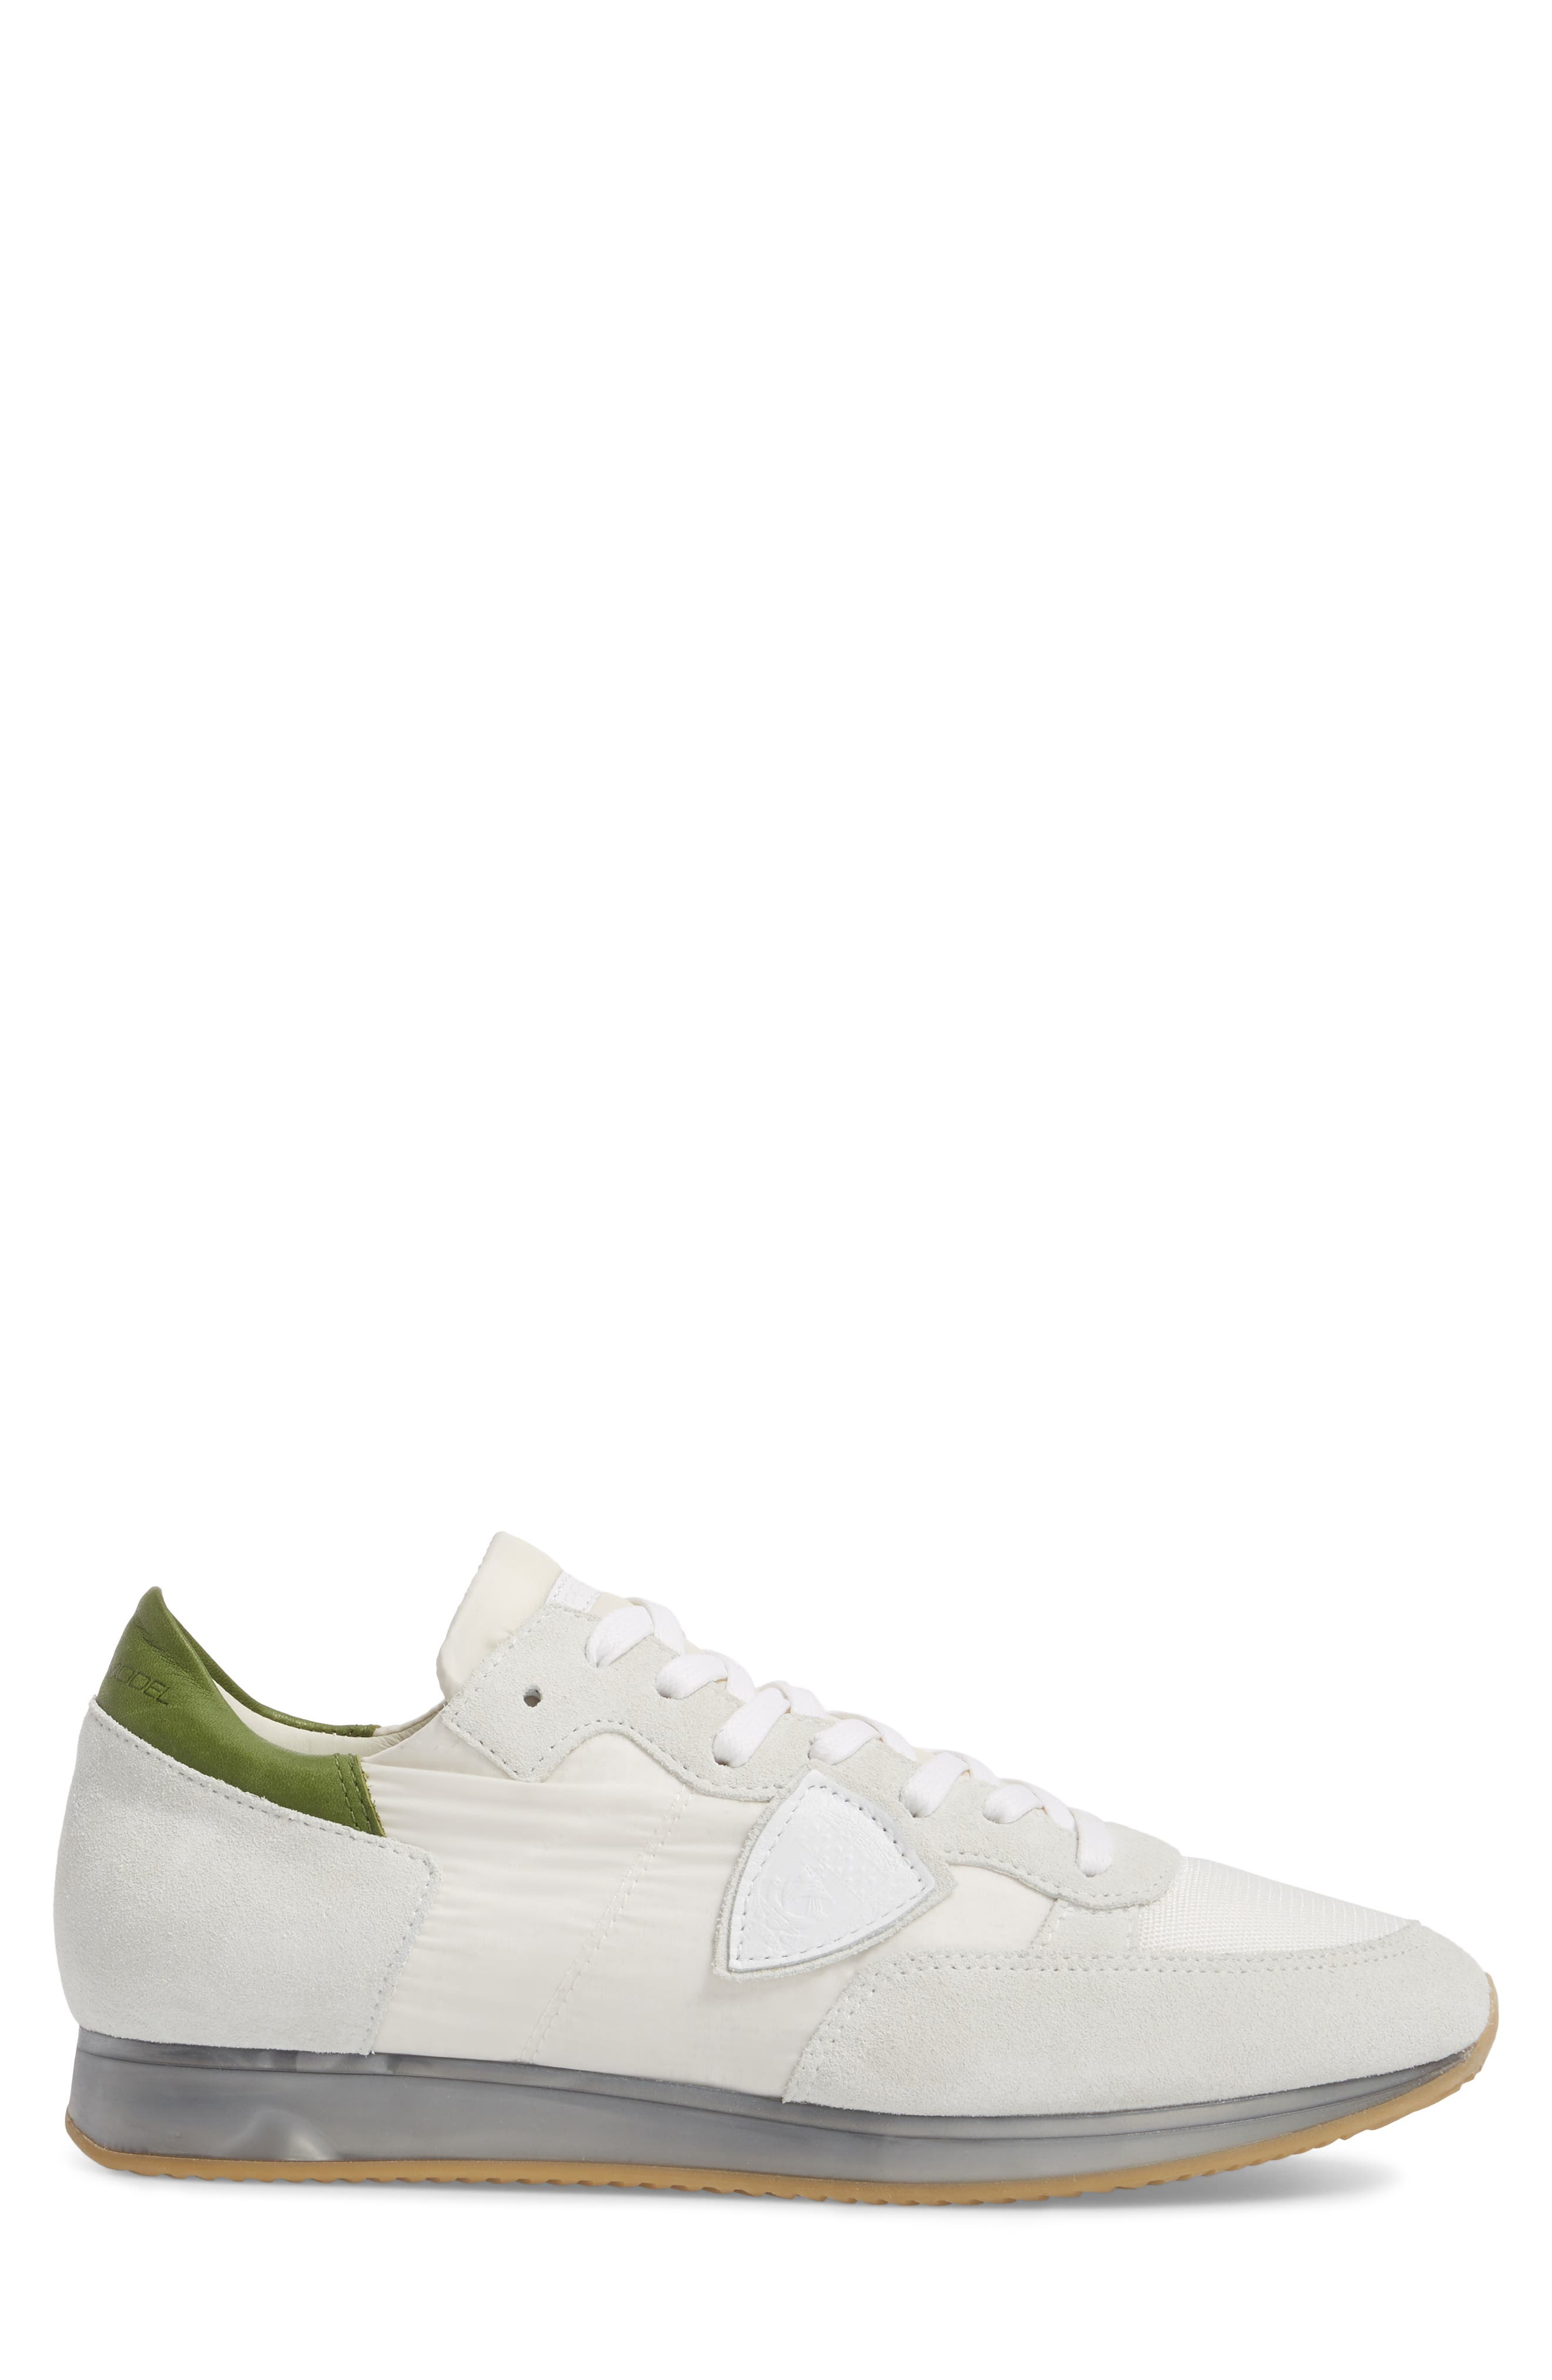 Tropez Sneaker,                             Alternate thumbnail 3, color,                             White/ Green